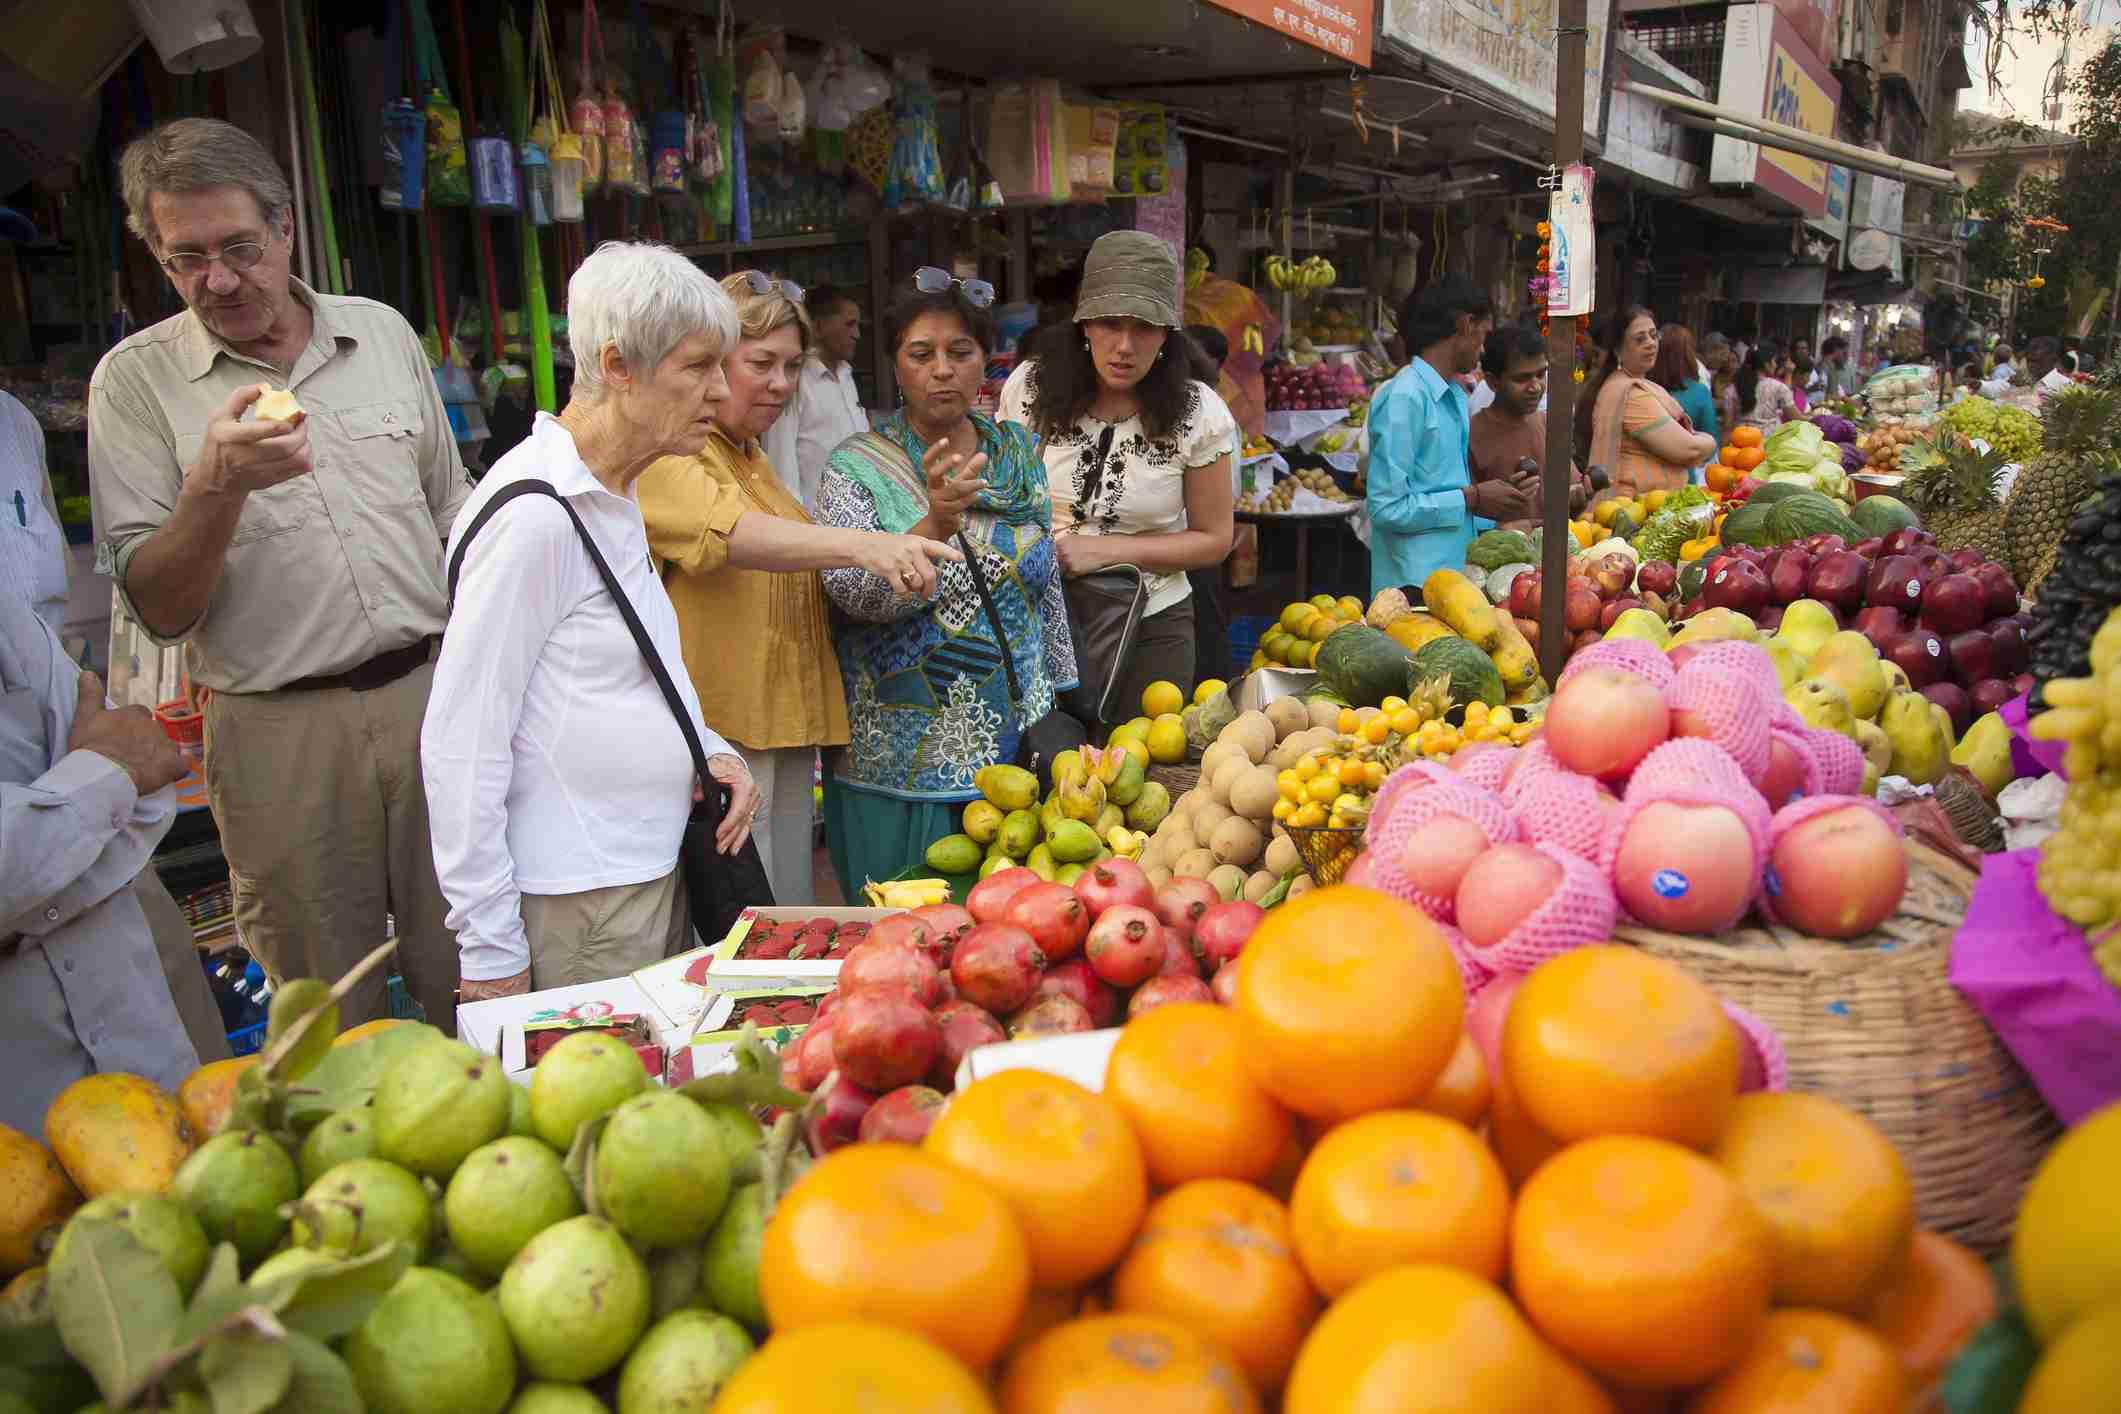 Tourists vegetable market on a street in Mumbai, India.